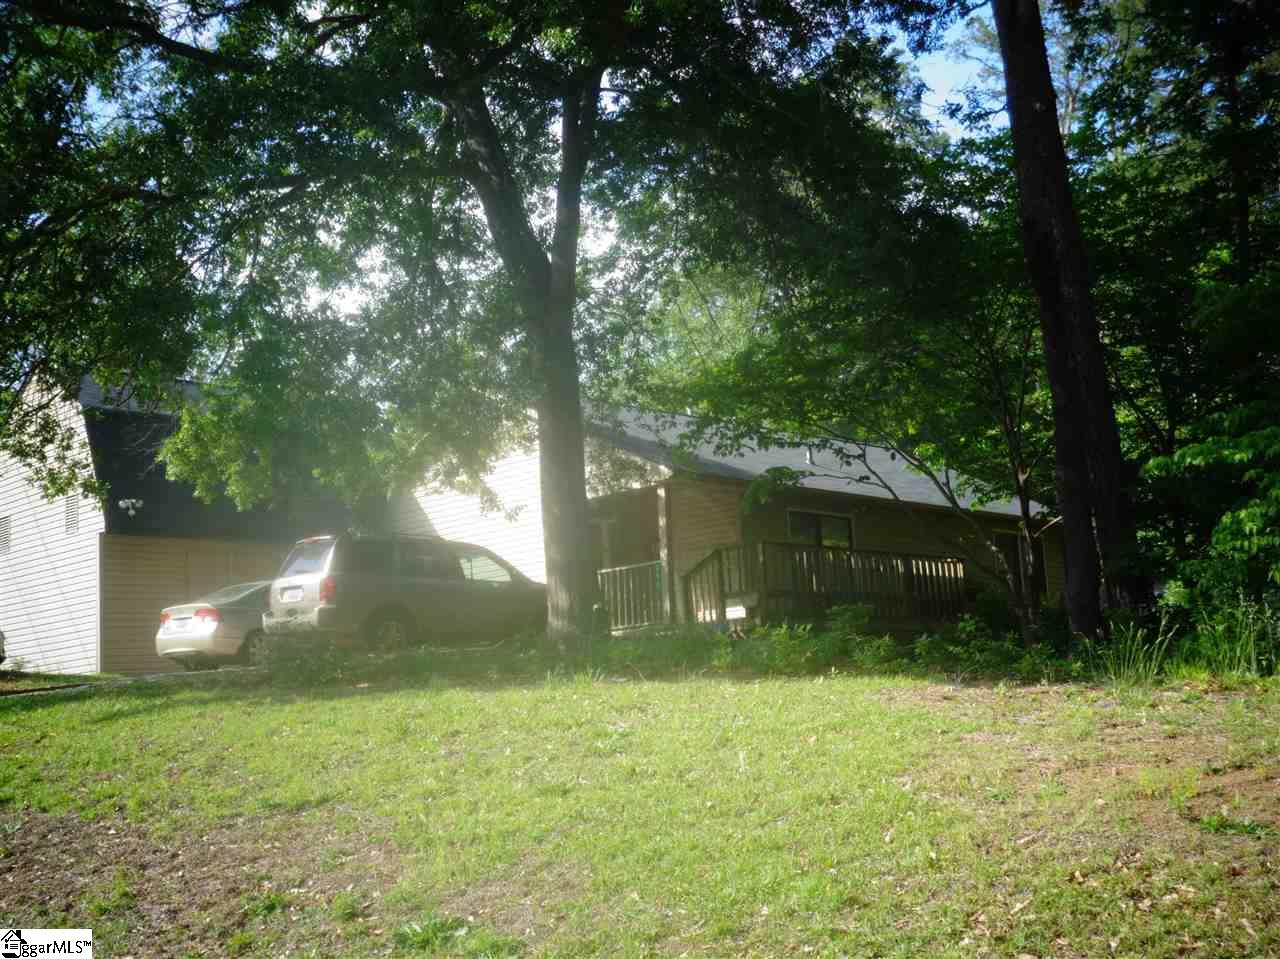 290 Tucker Road,Spartanburg,South Carolina 29306,2 Bedrooms Bedrooms,1 BathroomBathrooms,Single Family (Detached),Tucker,1344844